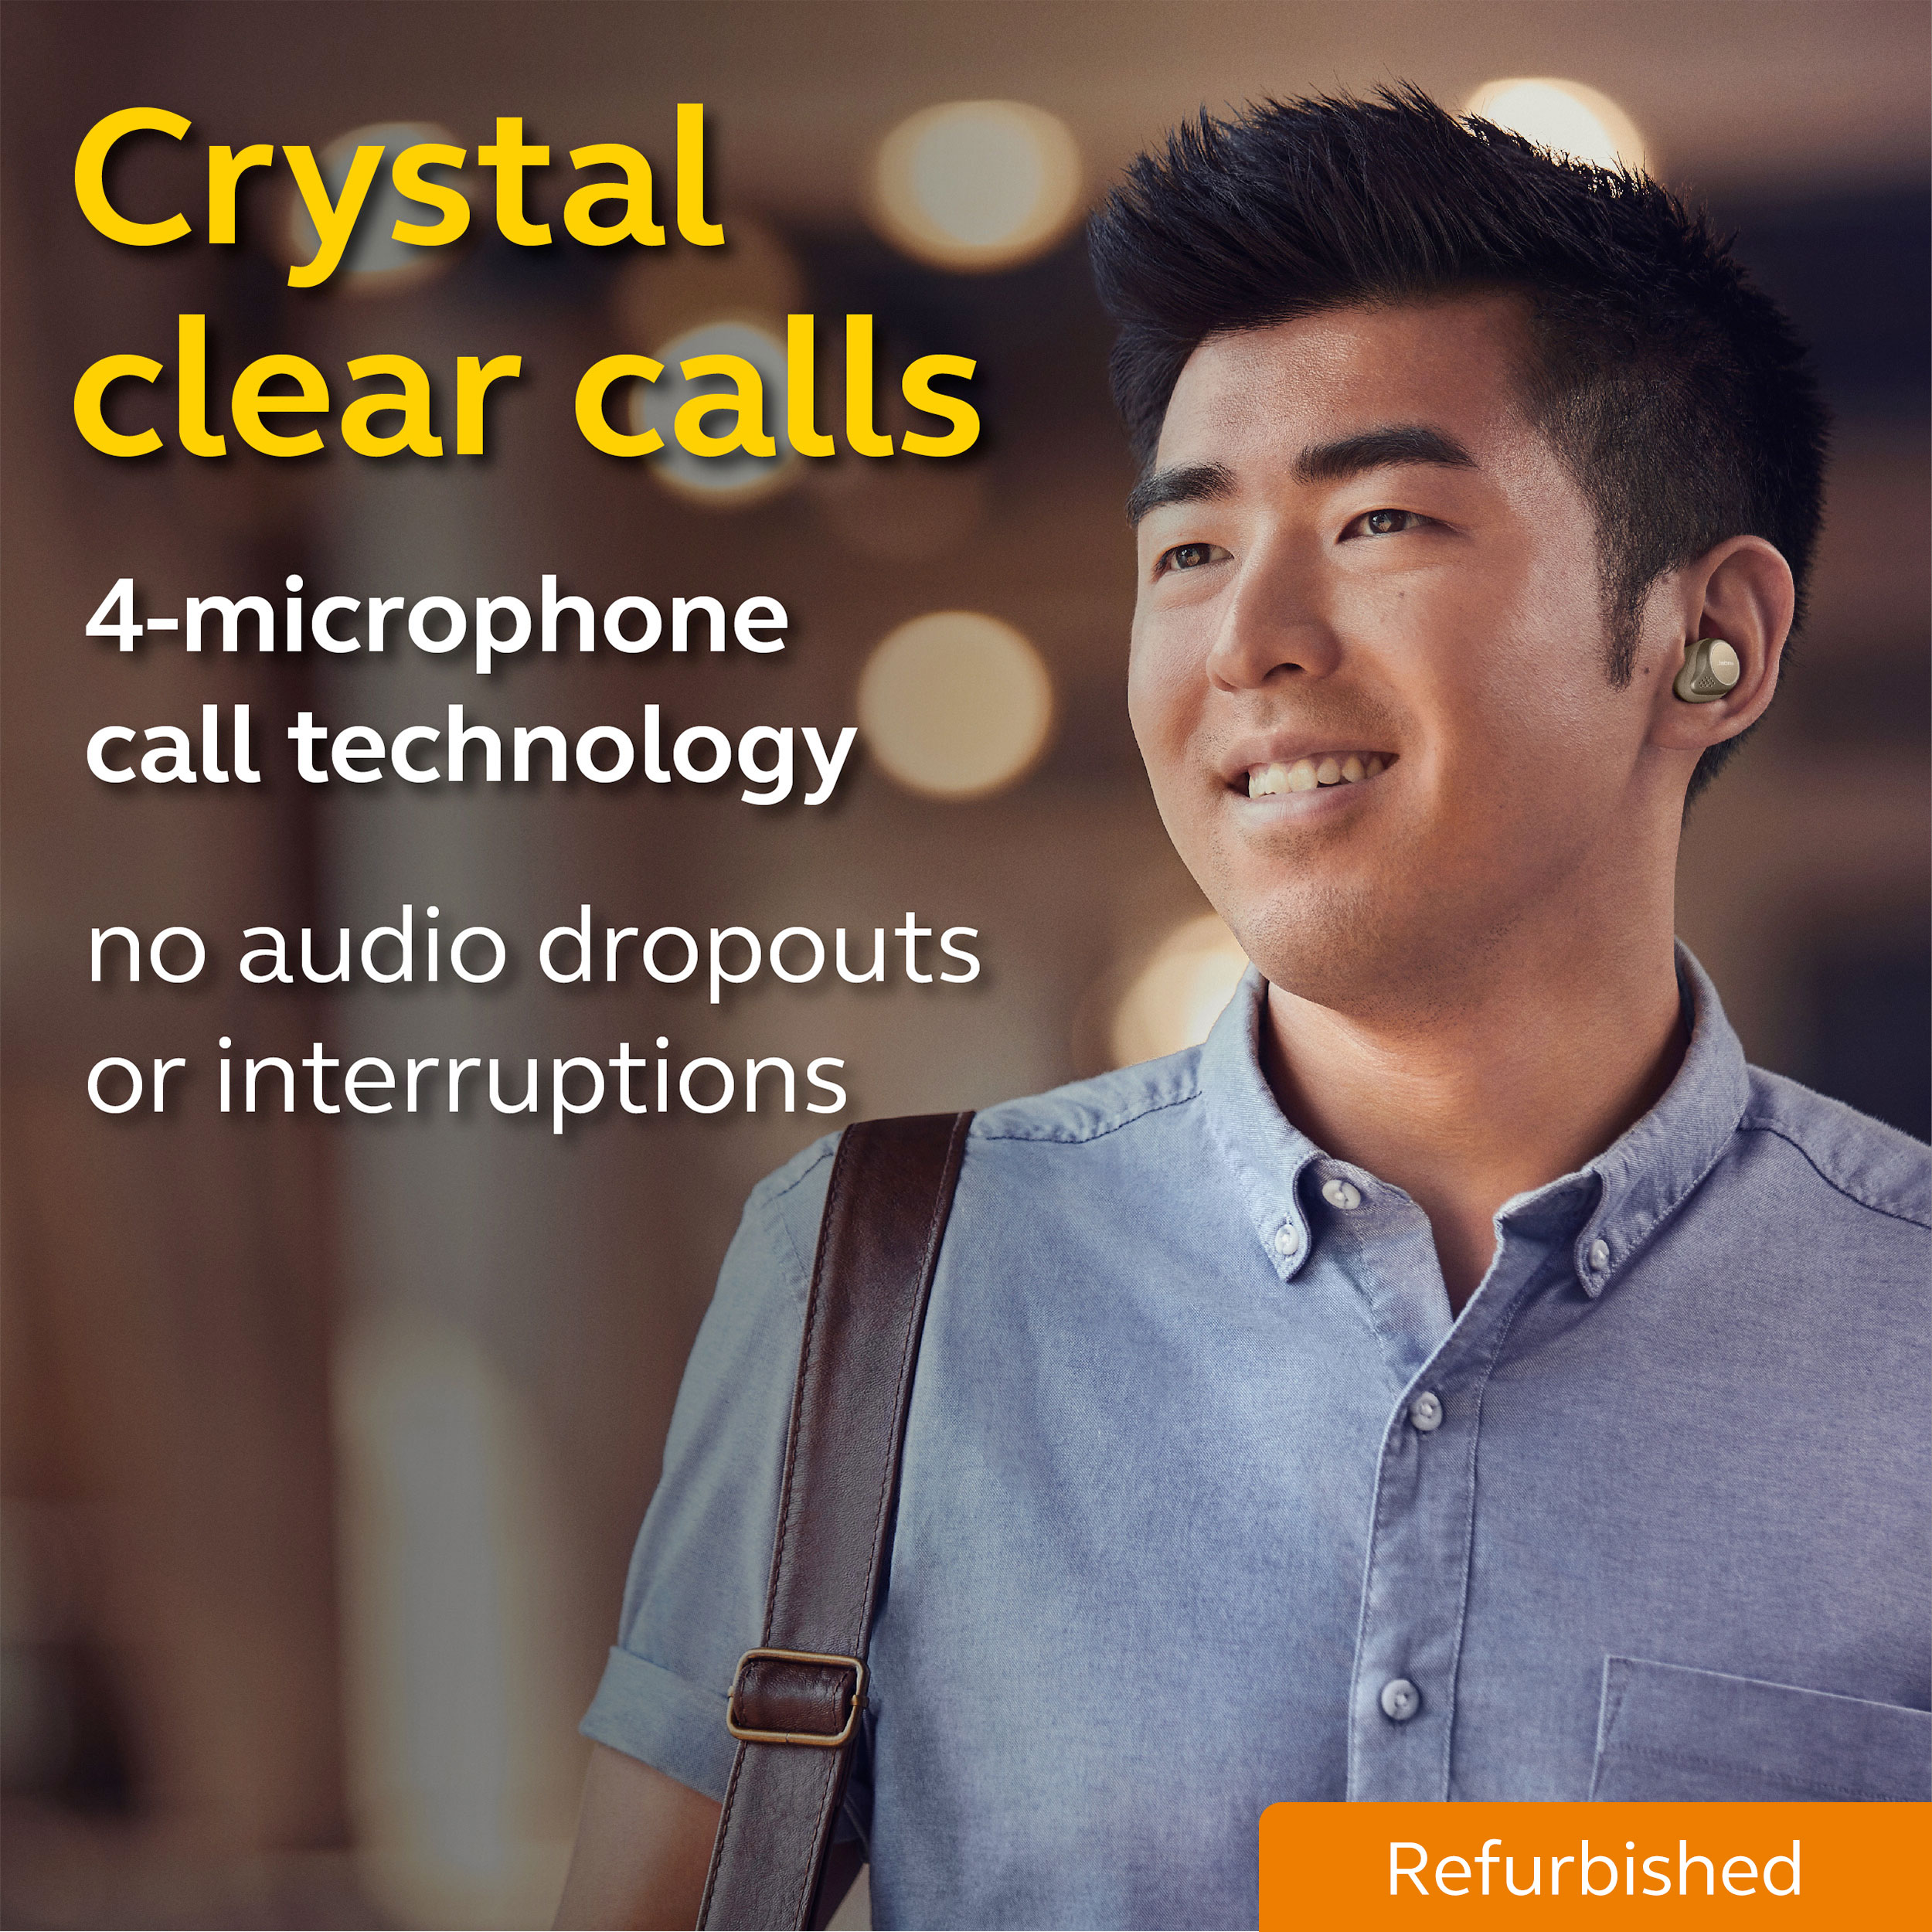 Jabra-Elite-75t-Voice-Assistant-True-Wireless-earbuds-Manufacturer-Refurbished thumbnail 12